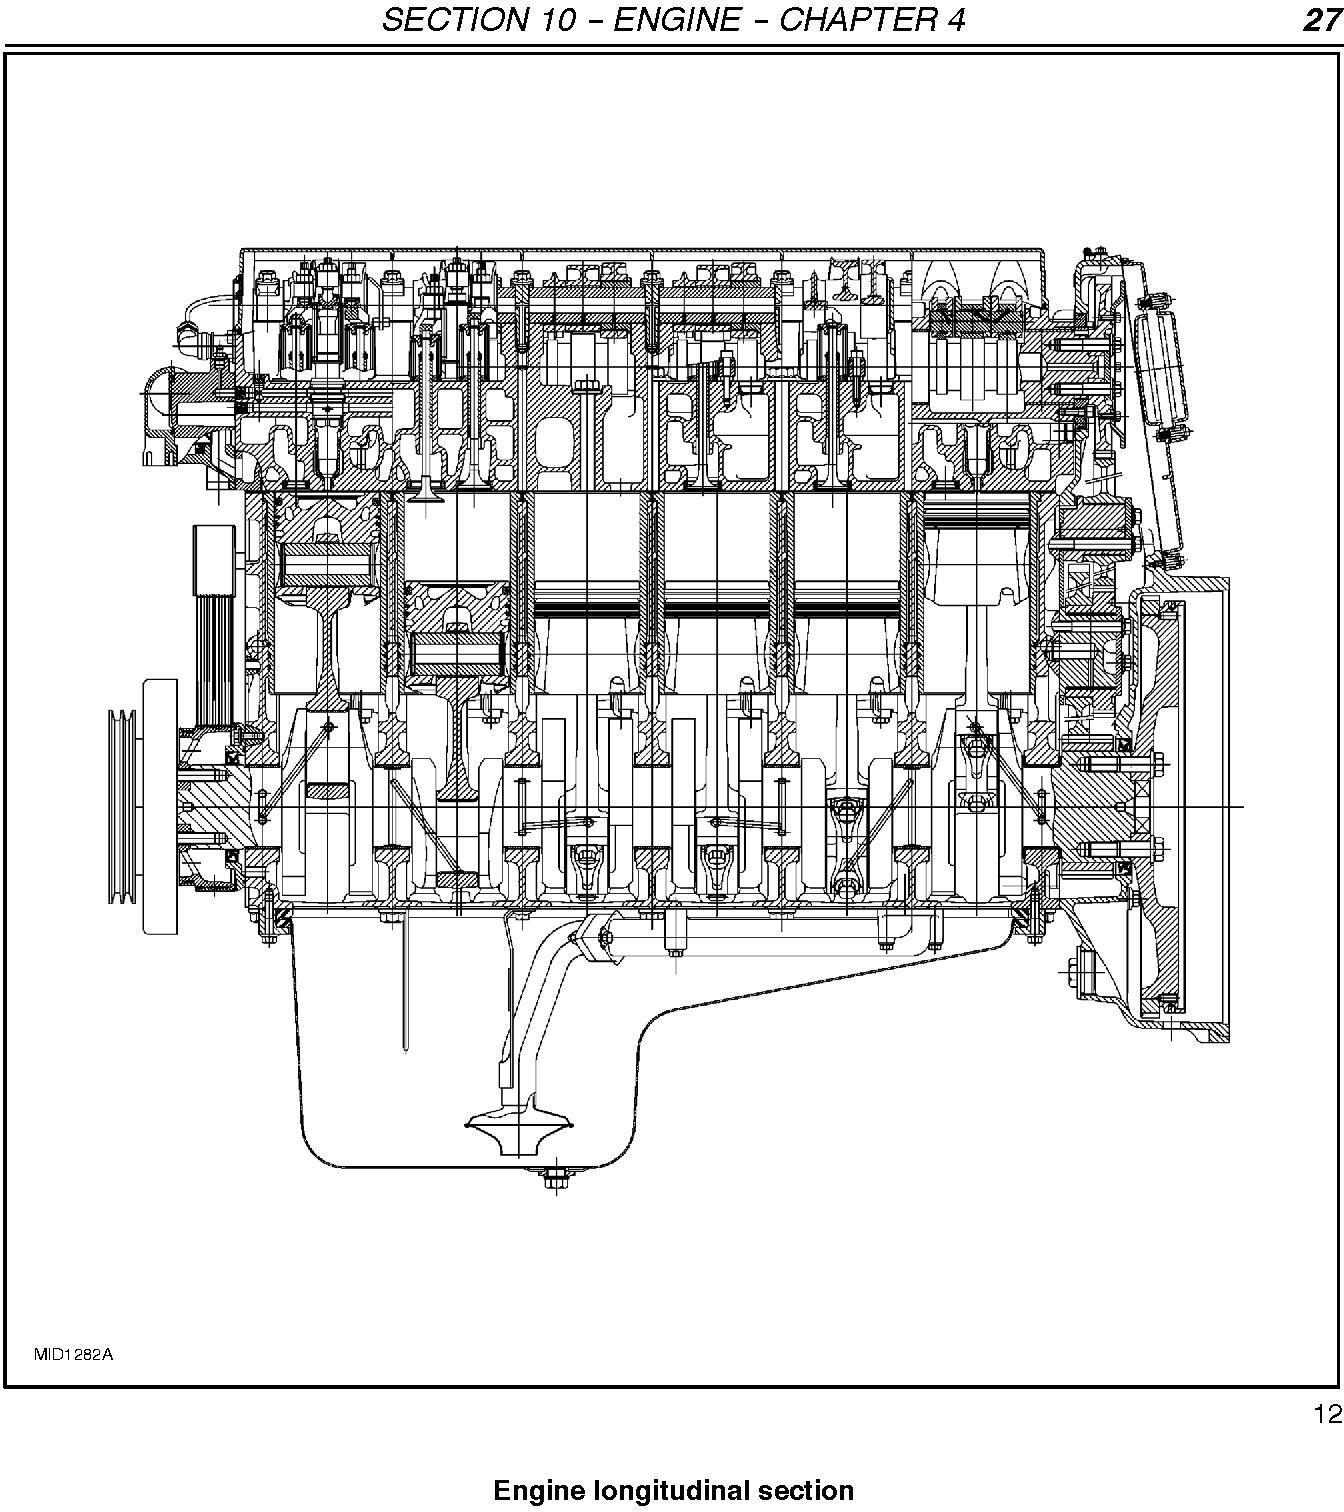 New Holland FX30 FX40 FX50 FX60 SP Forage Harvester Service Manual - 3